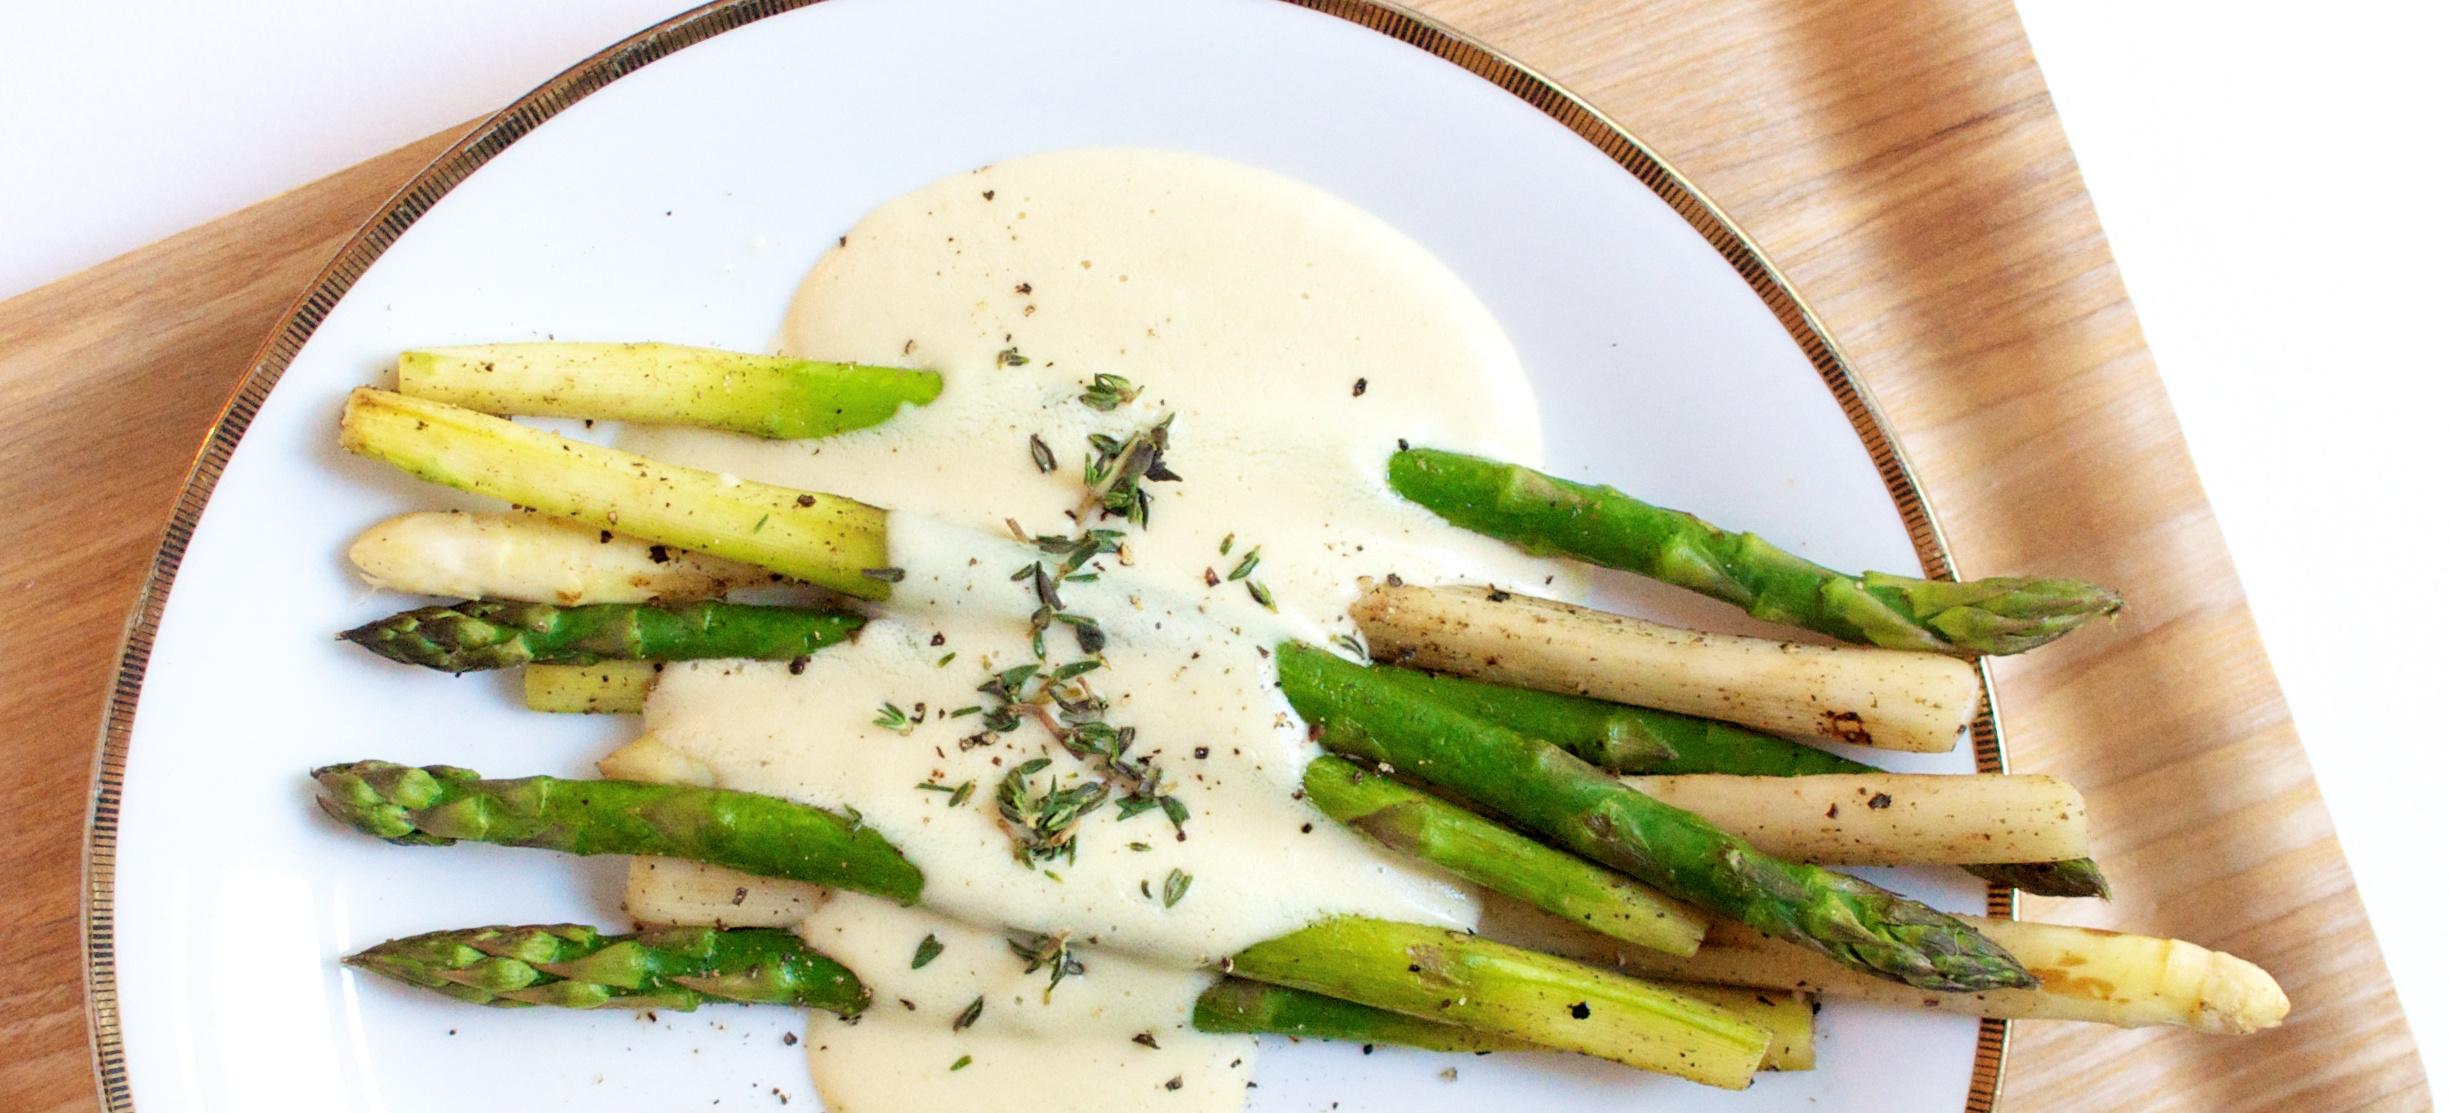 Spargel mit veganer Sauce Hollandaise